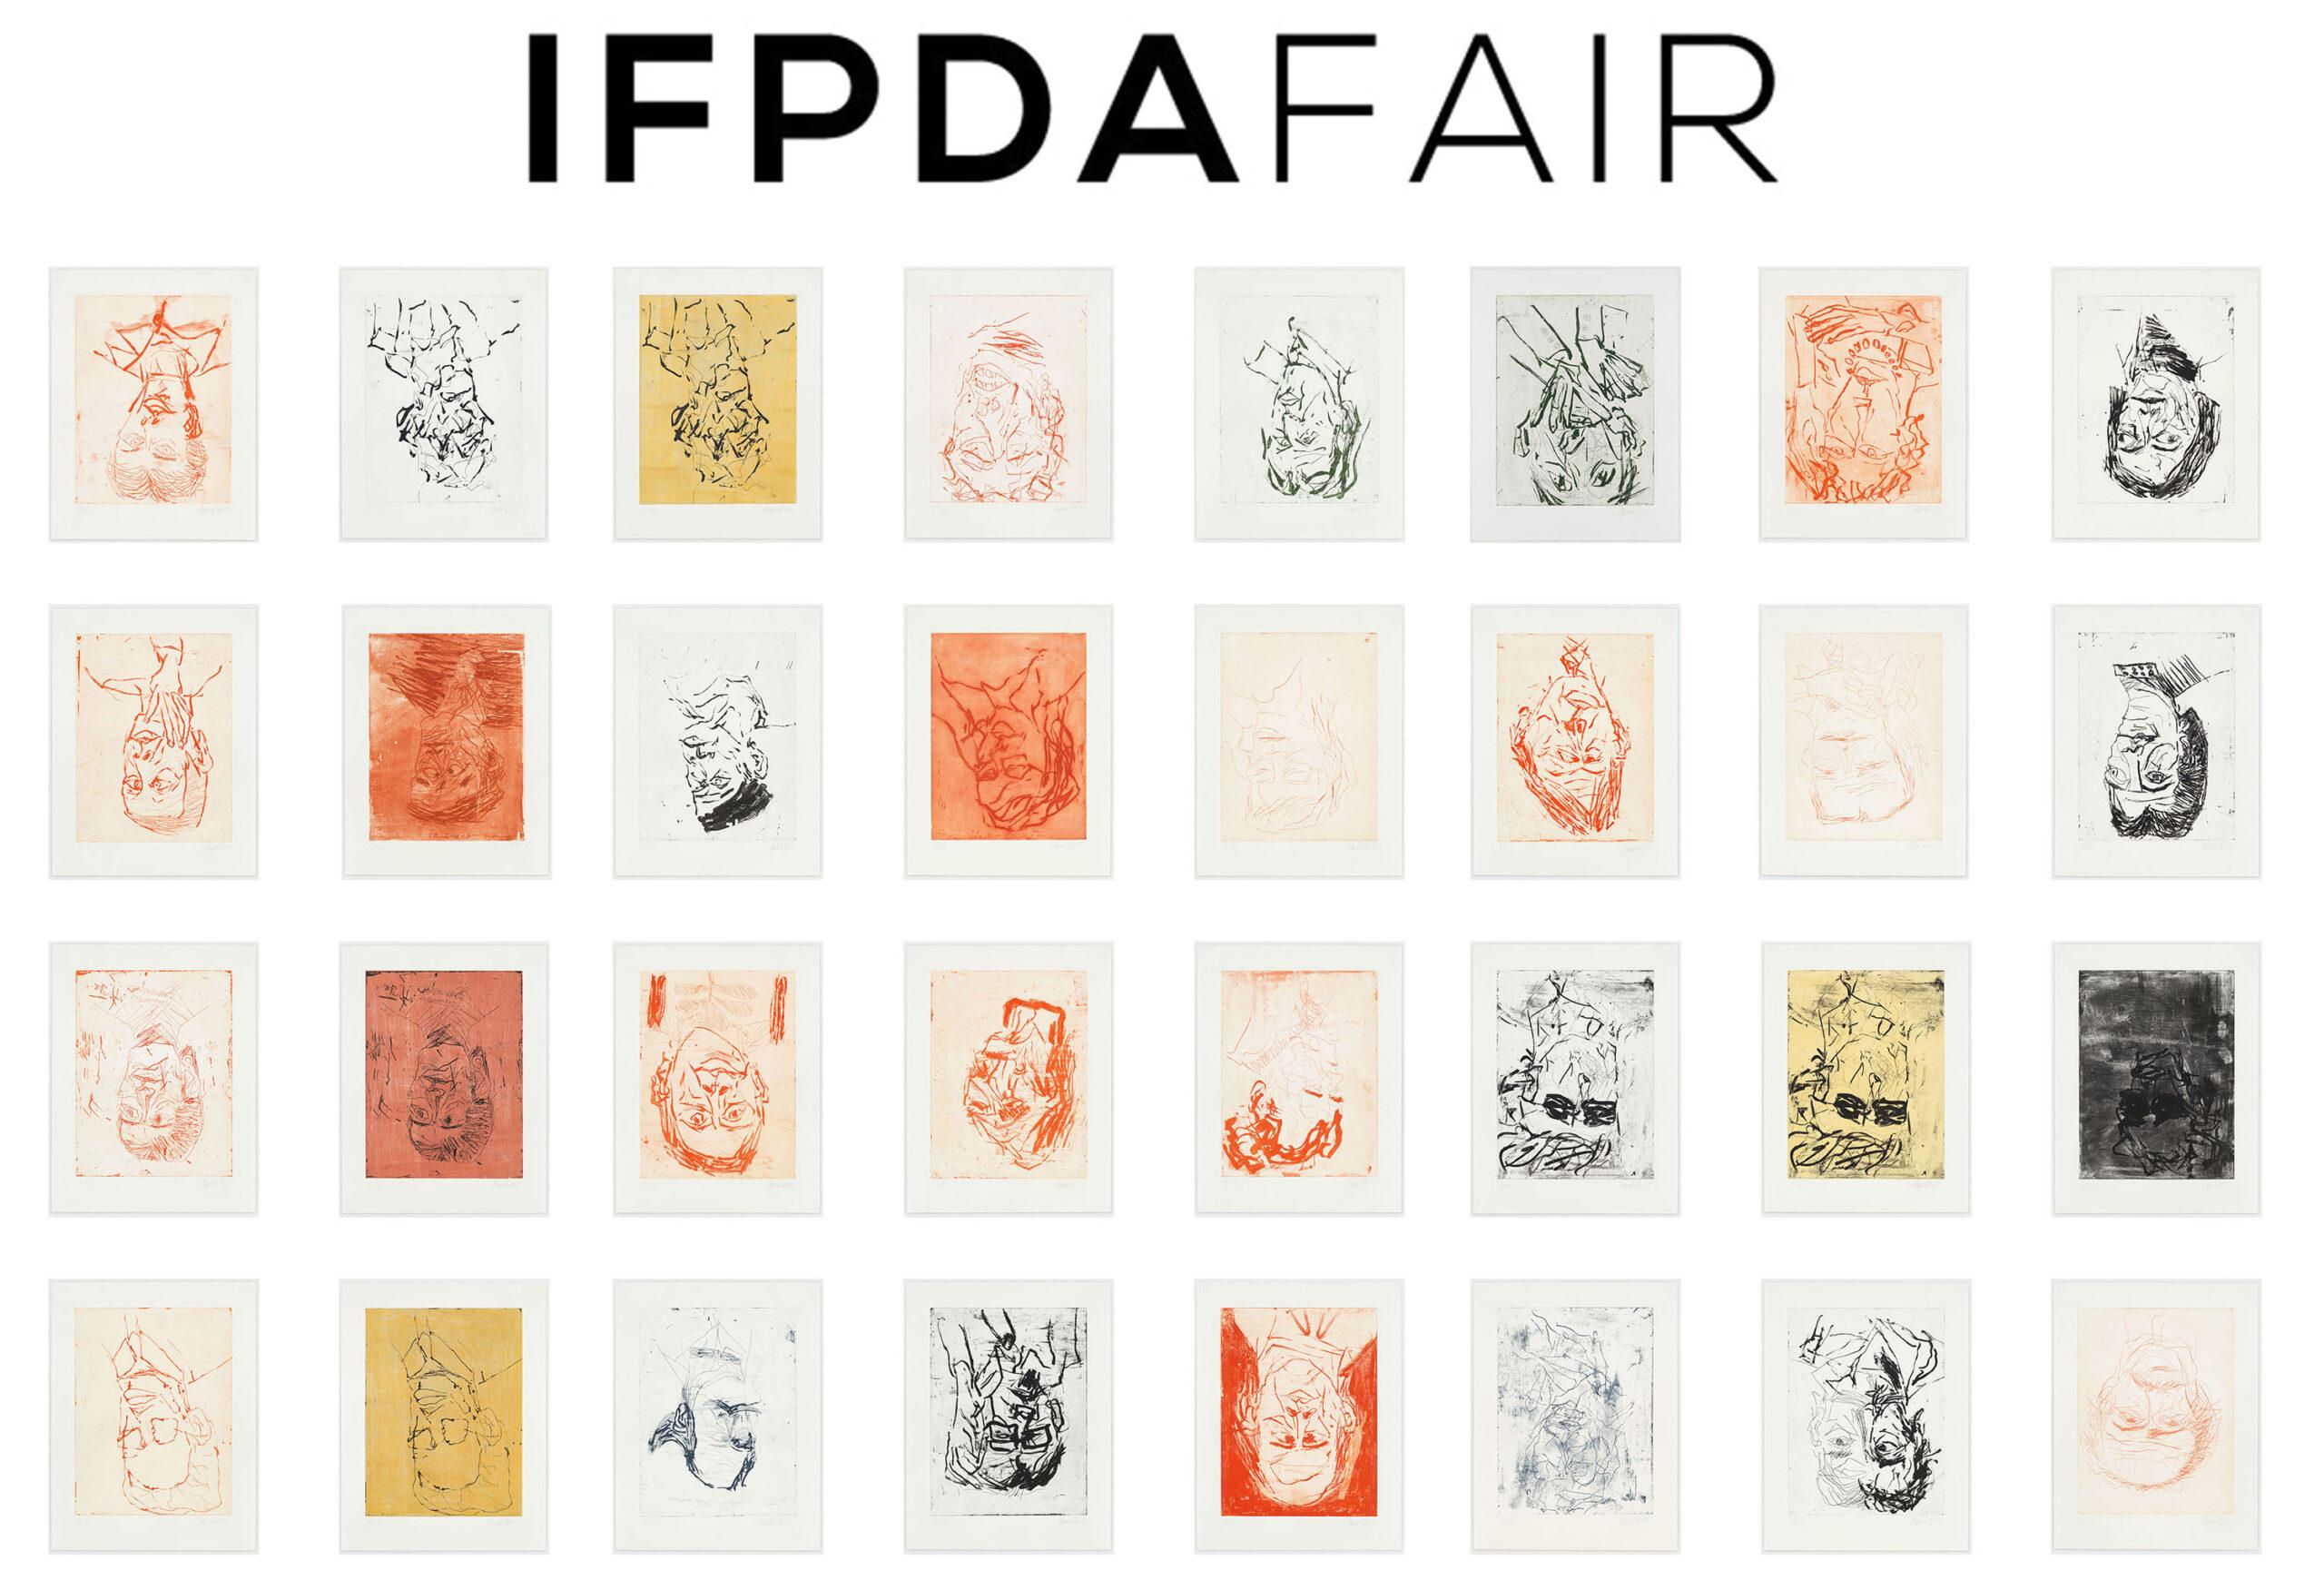 IFPDA Art Fair 2021 - Devotion by Georg Baselitz